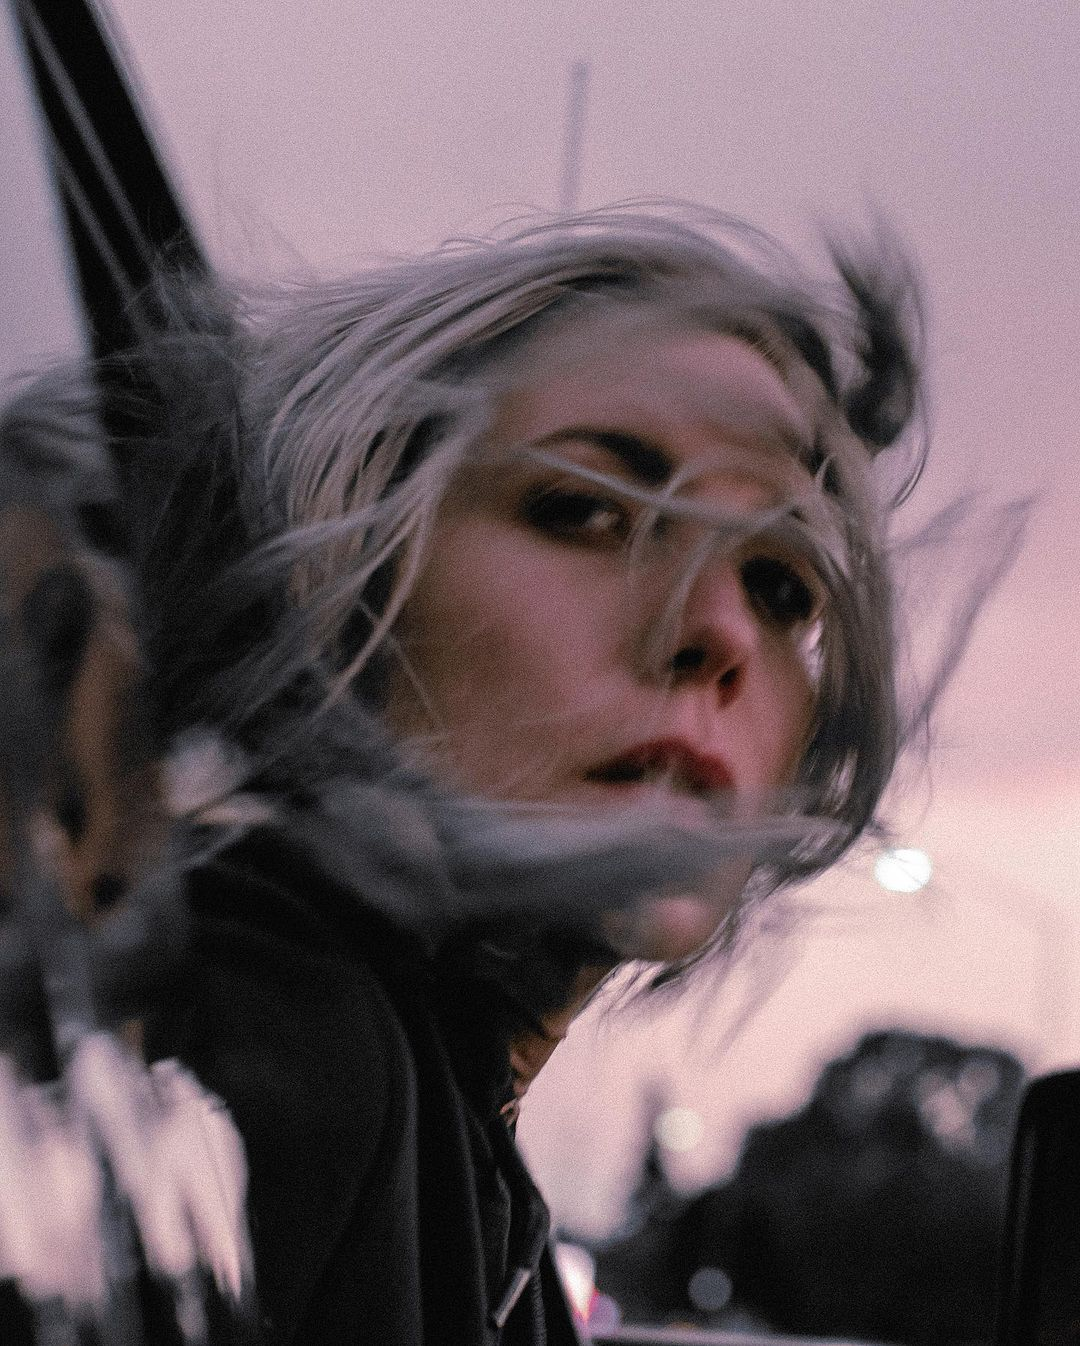 skylar grey 2021 - Skylar Grey - Partly Cloudy With a Chance of Tears